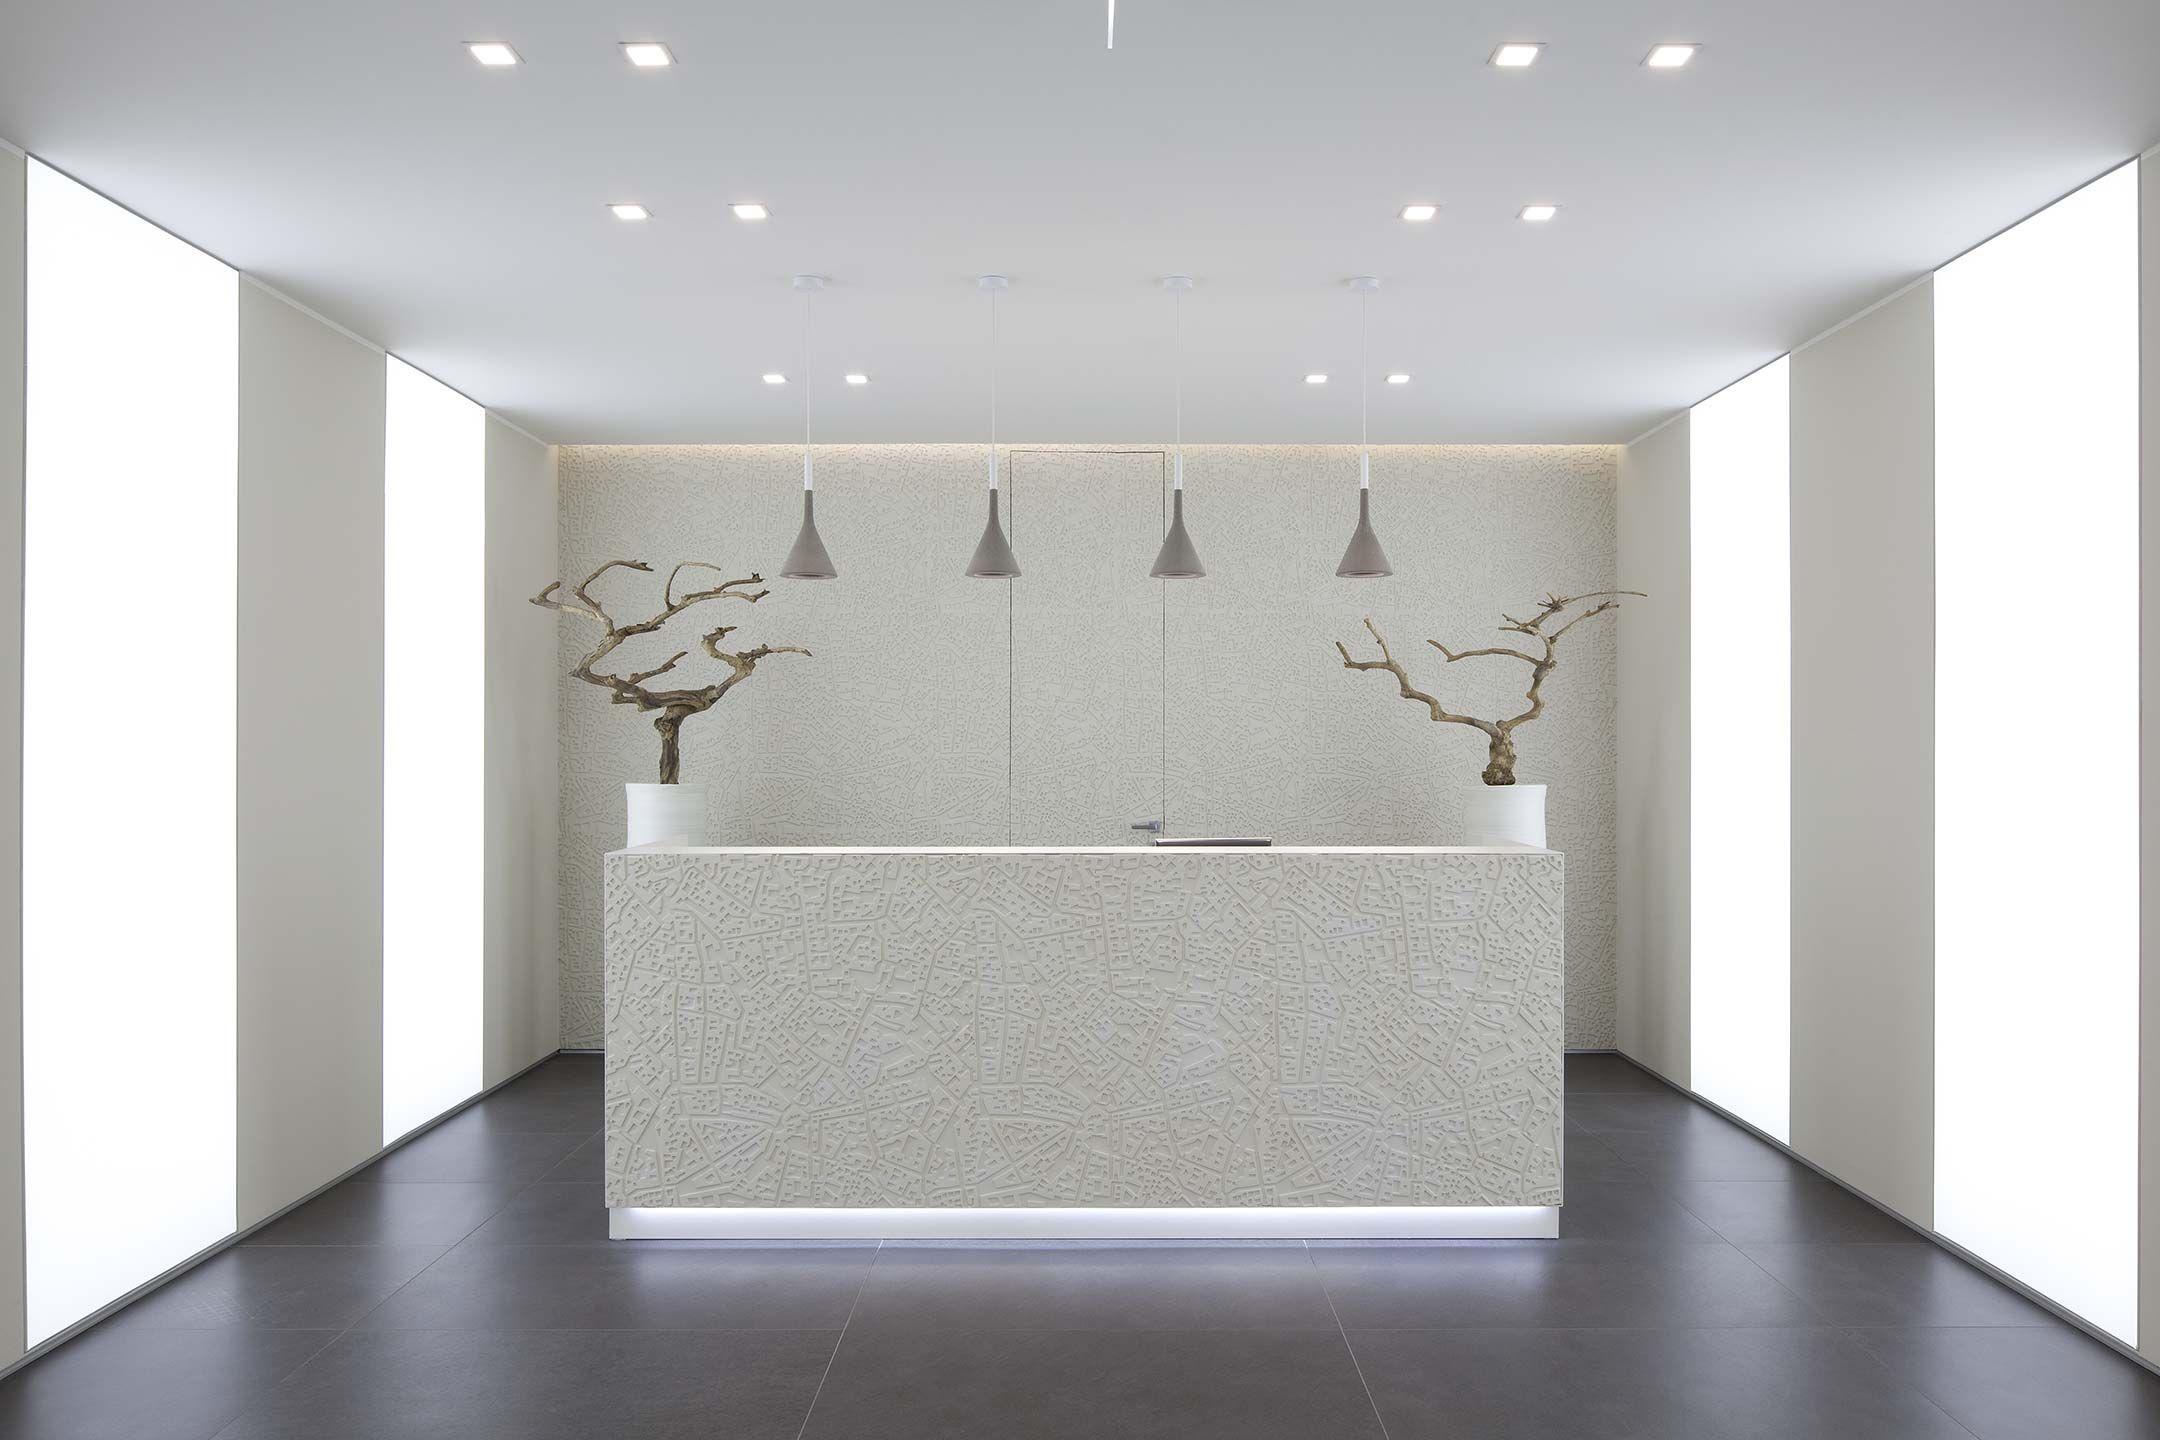 Badezimmer design malta telecom italia headquarters in milan was recently renewed thanks